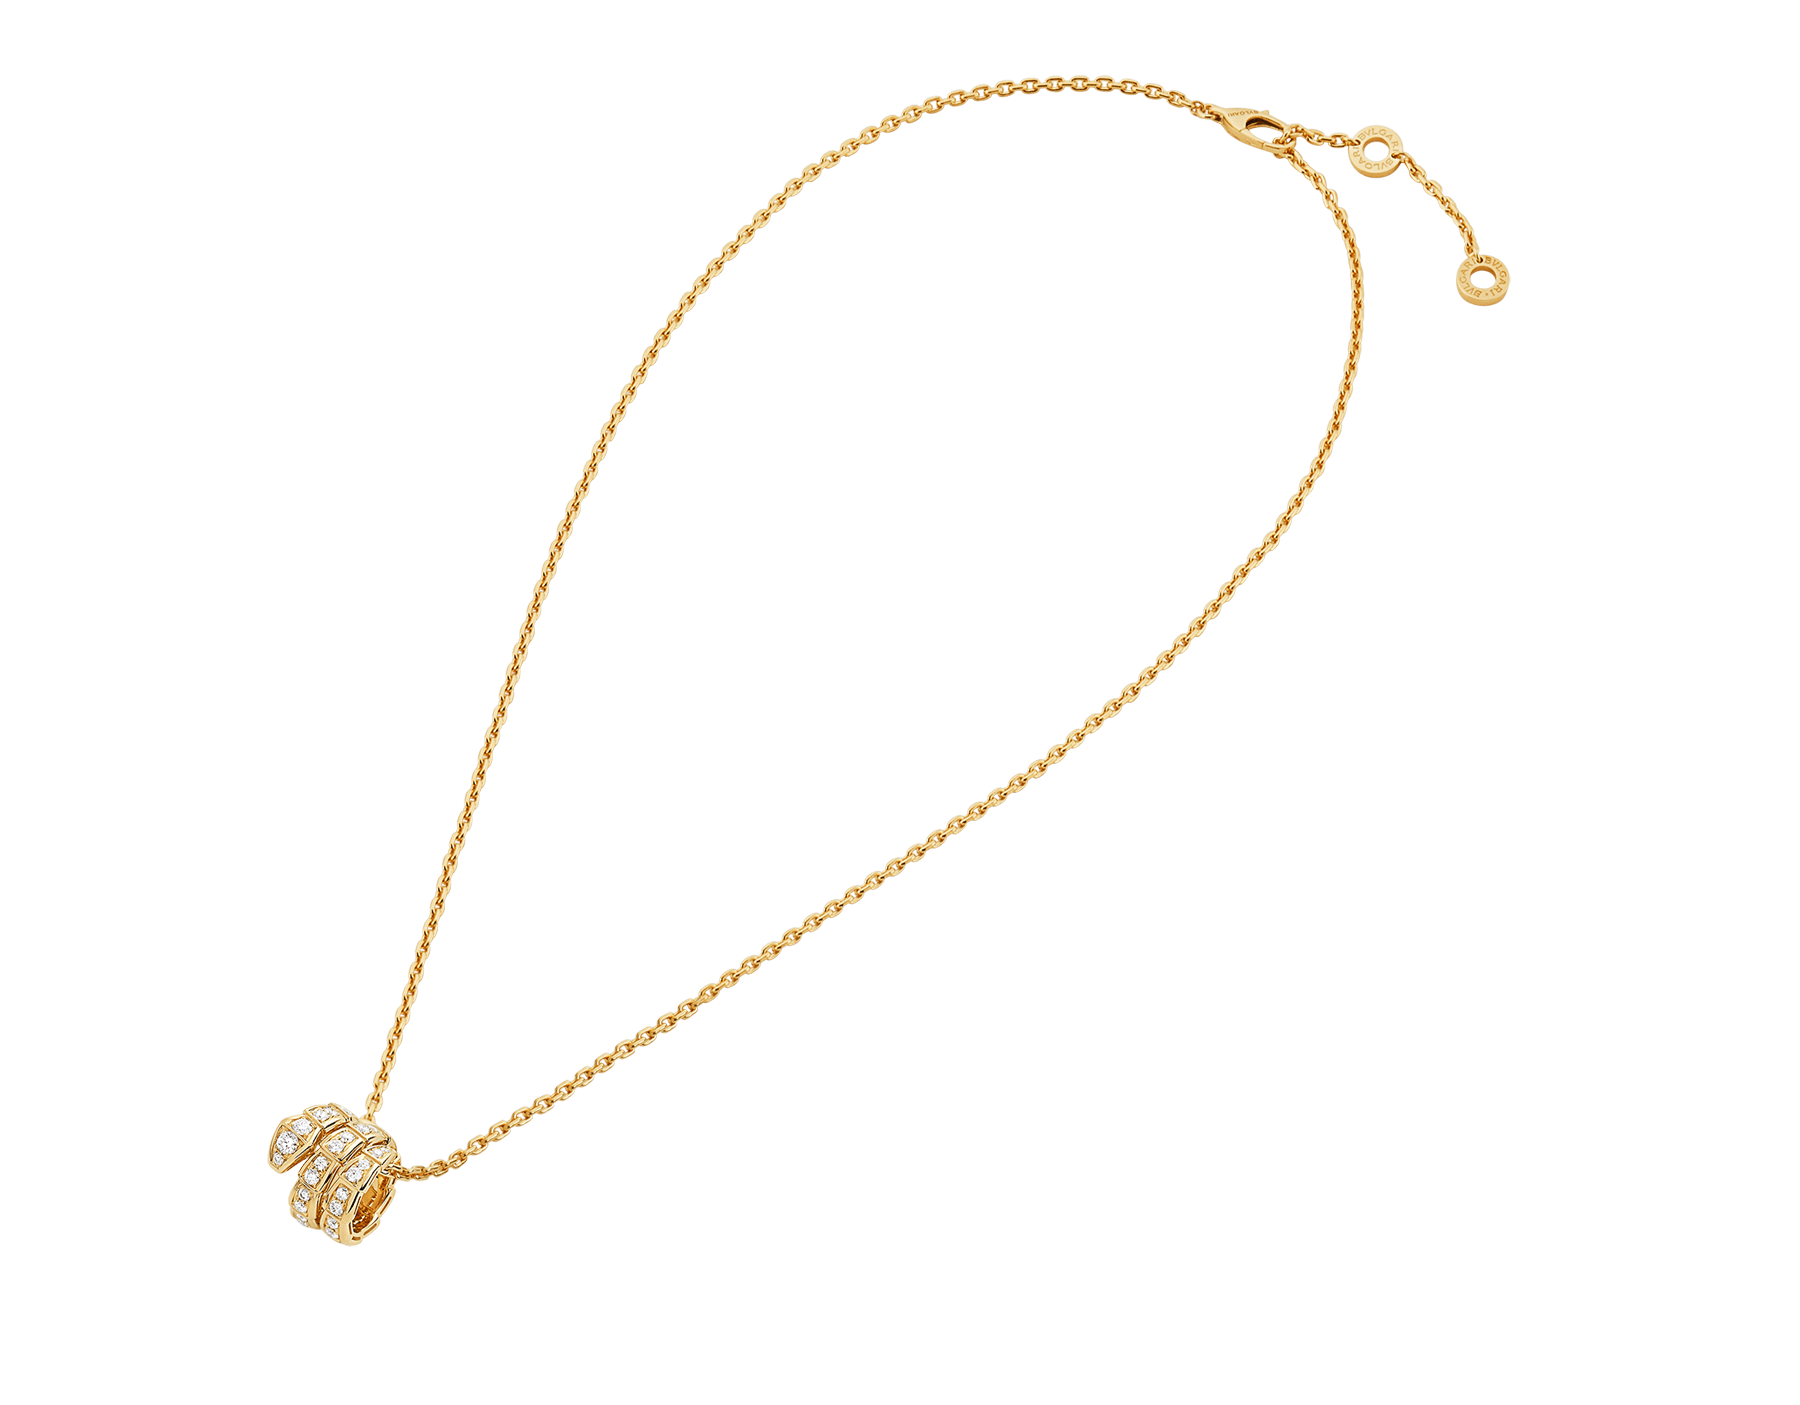 Serpenti Viper 18 kt yellow gold pendant necklace set with pavé diamonds 357936 image 2